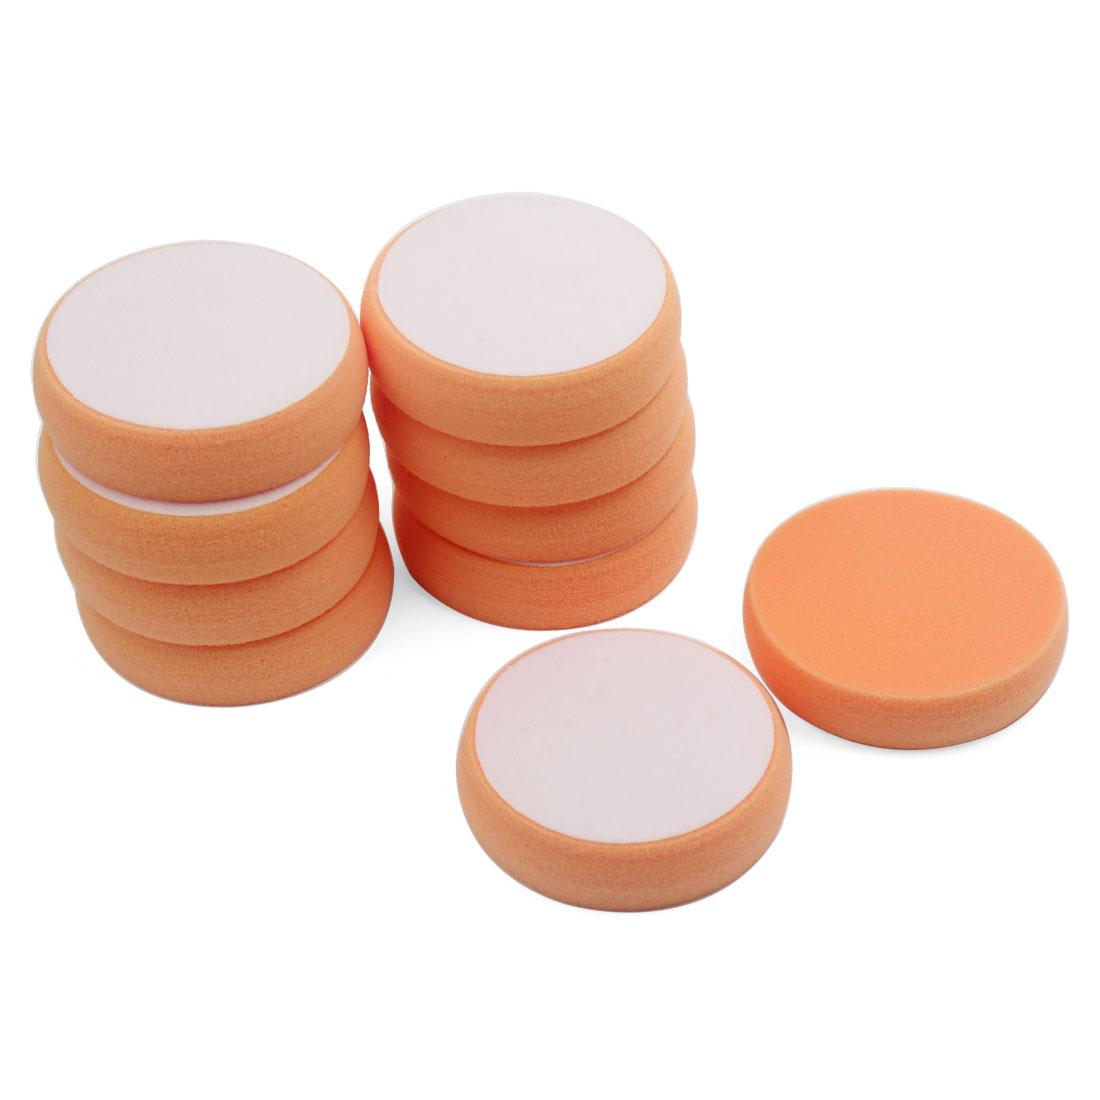 "10PCS 3.5"" Diameter Flat Sponge Buffing Polishing Pad Orange for Car Polisher"